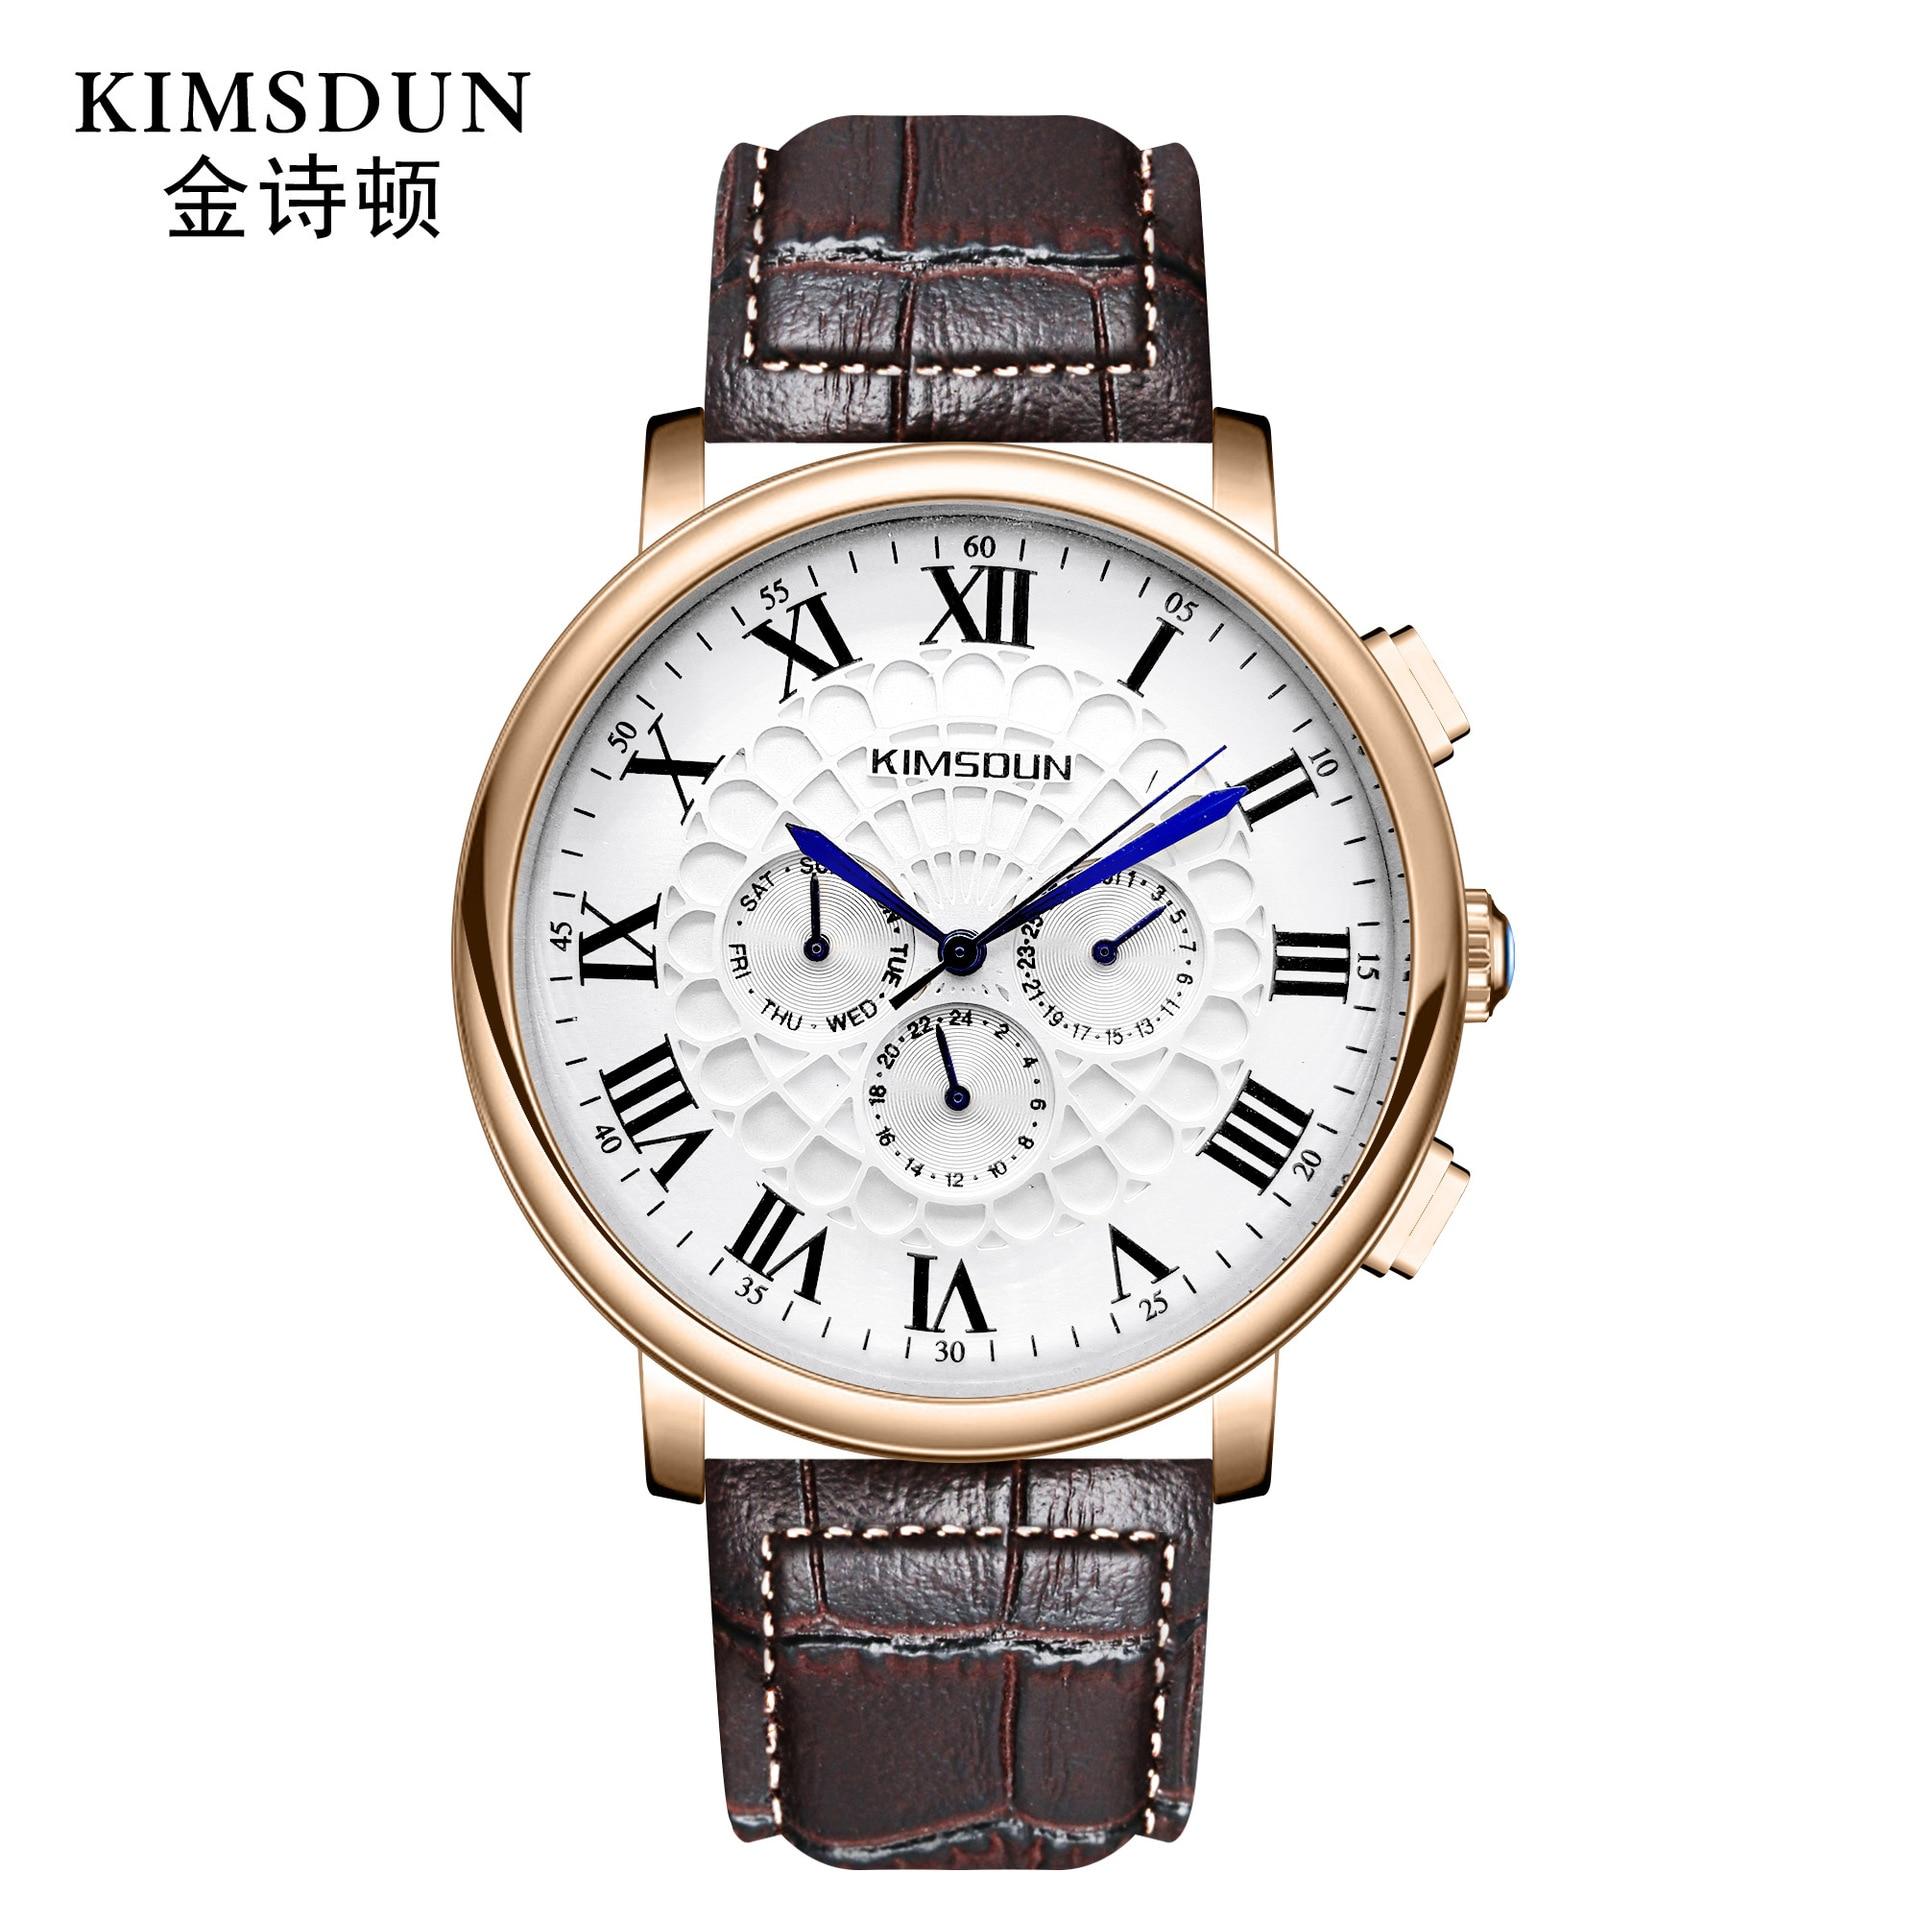 KIMSDUN Automatic Mechanical Watch Men Luxury Brand Business Waterproof Designer Watch Men Fashion Watches Mens New Arrvial 2019